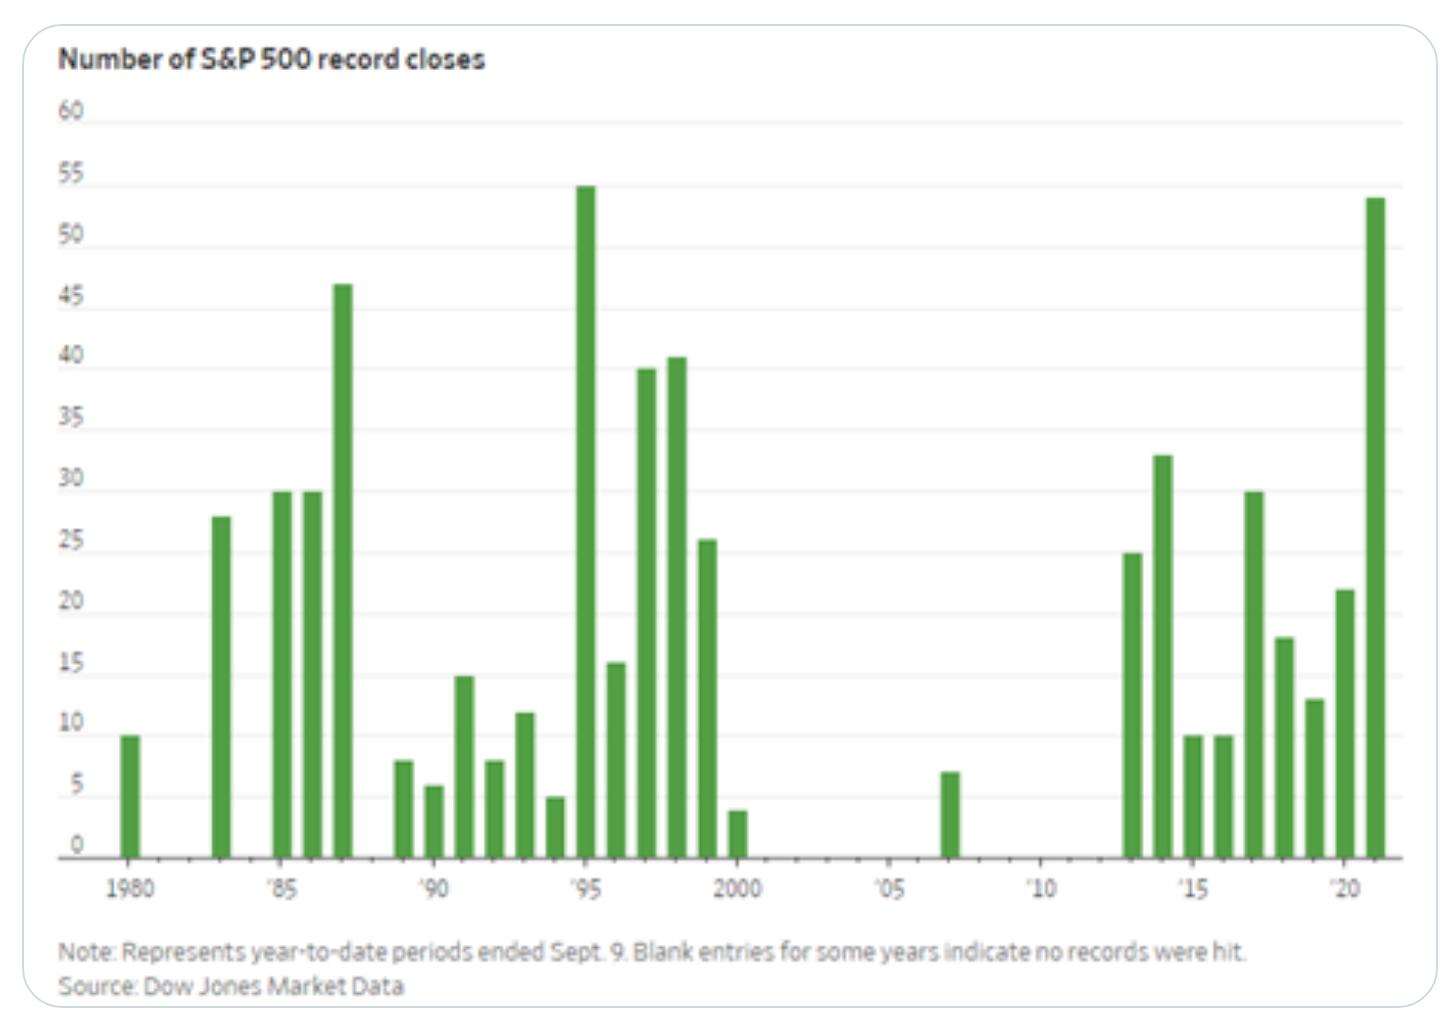 S&P record closes